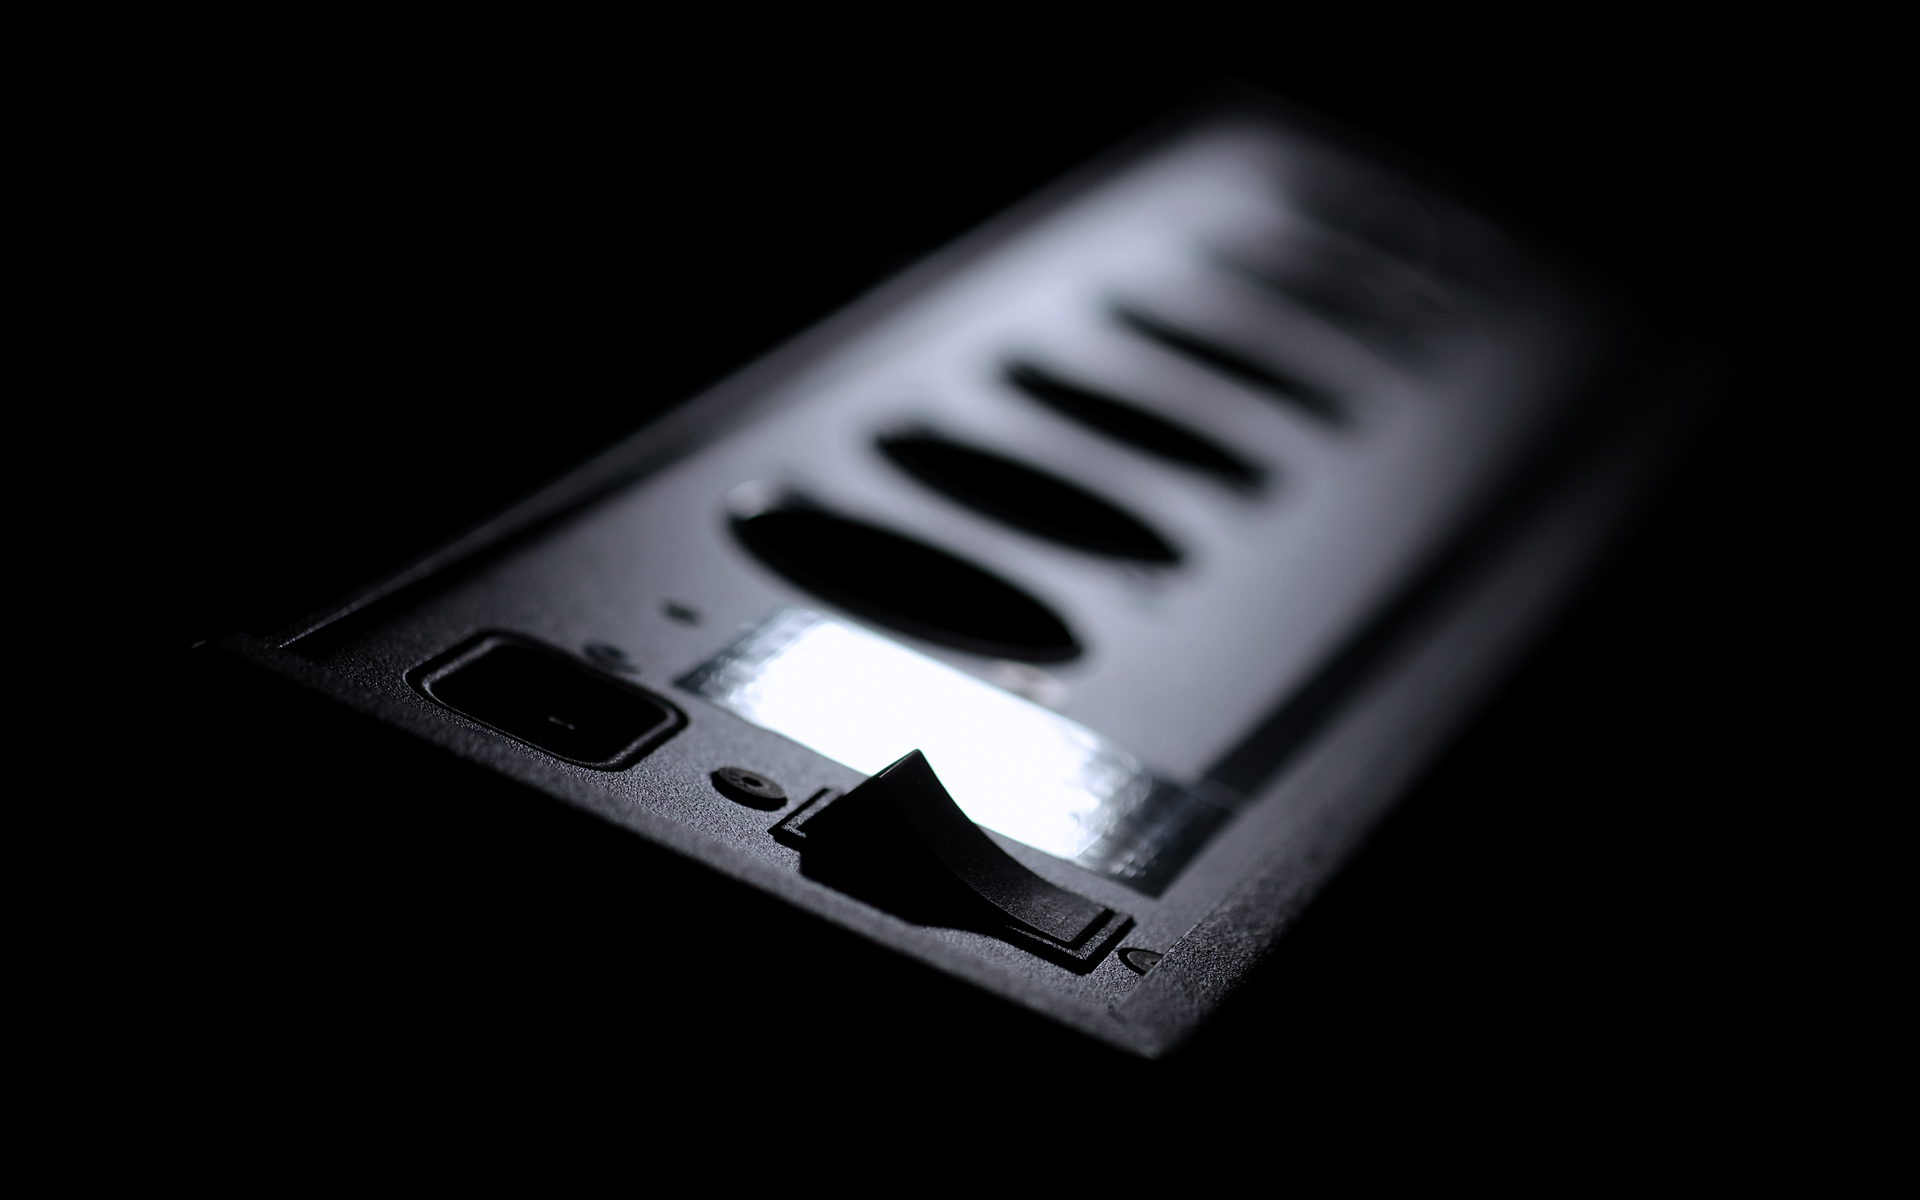 GIGAWATT PC-3SE EVO+ 6x NZ outlet power conditioner w LC3